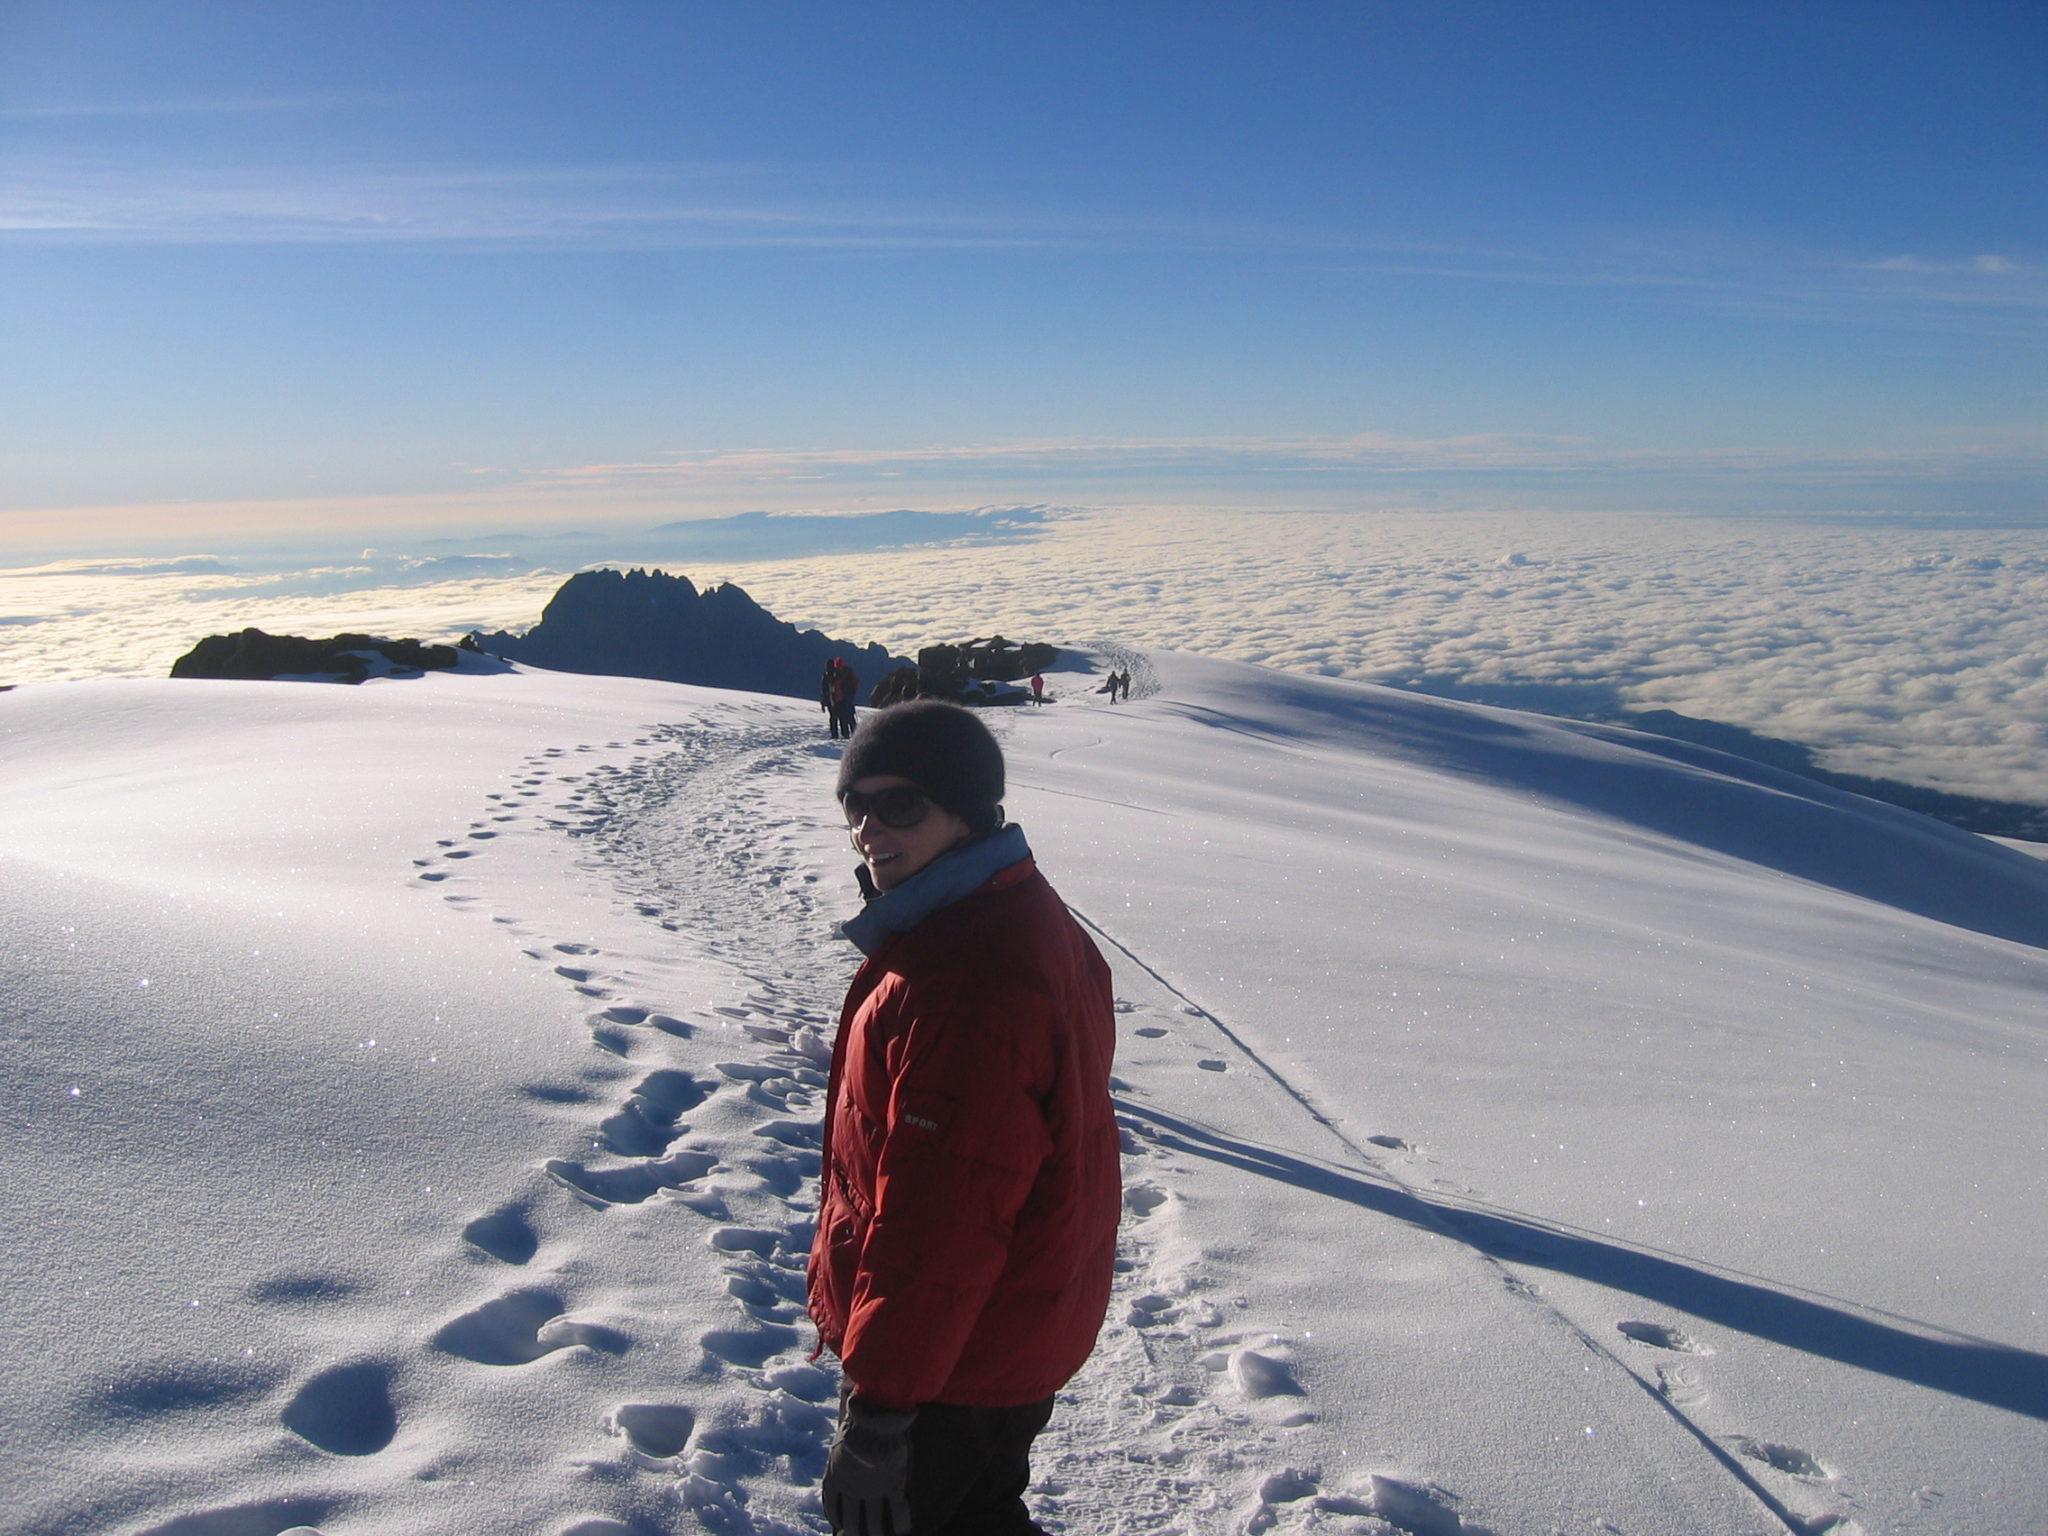 Kilimanjaro Shira Plateau Africa Trek: Trekking in Tanzania